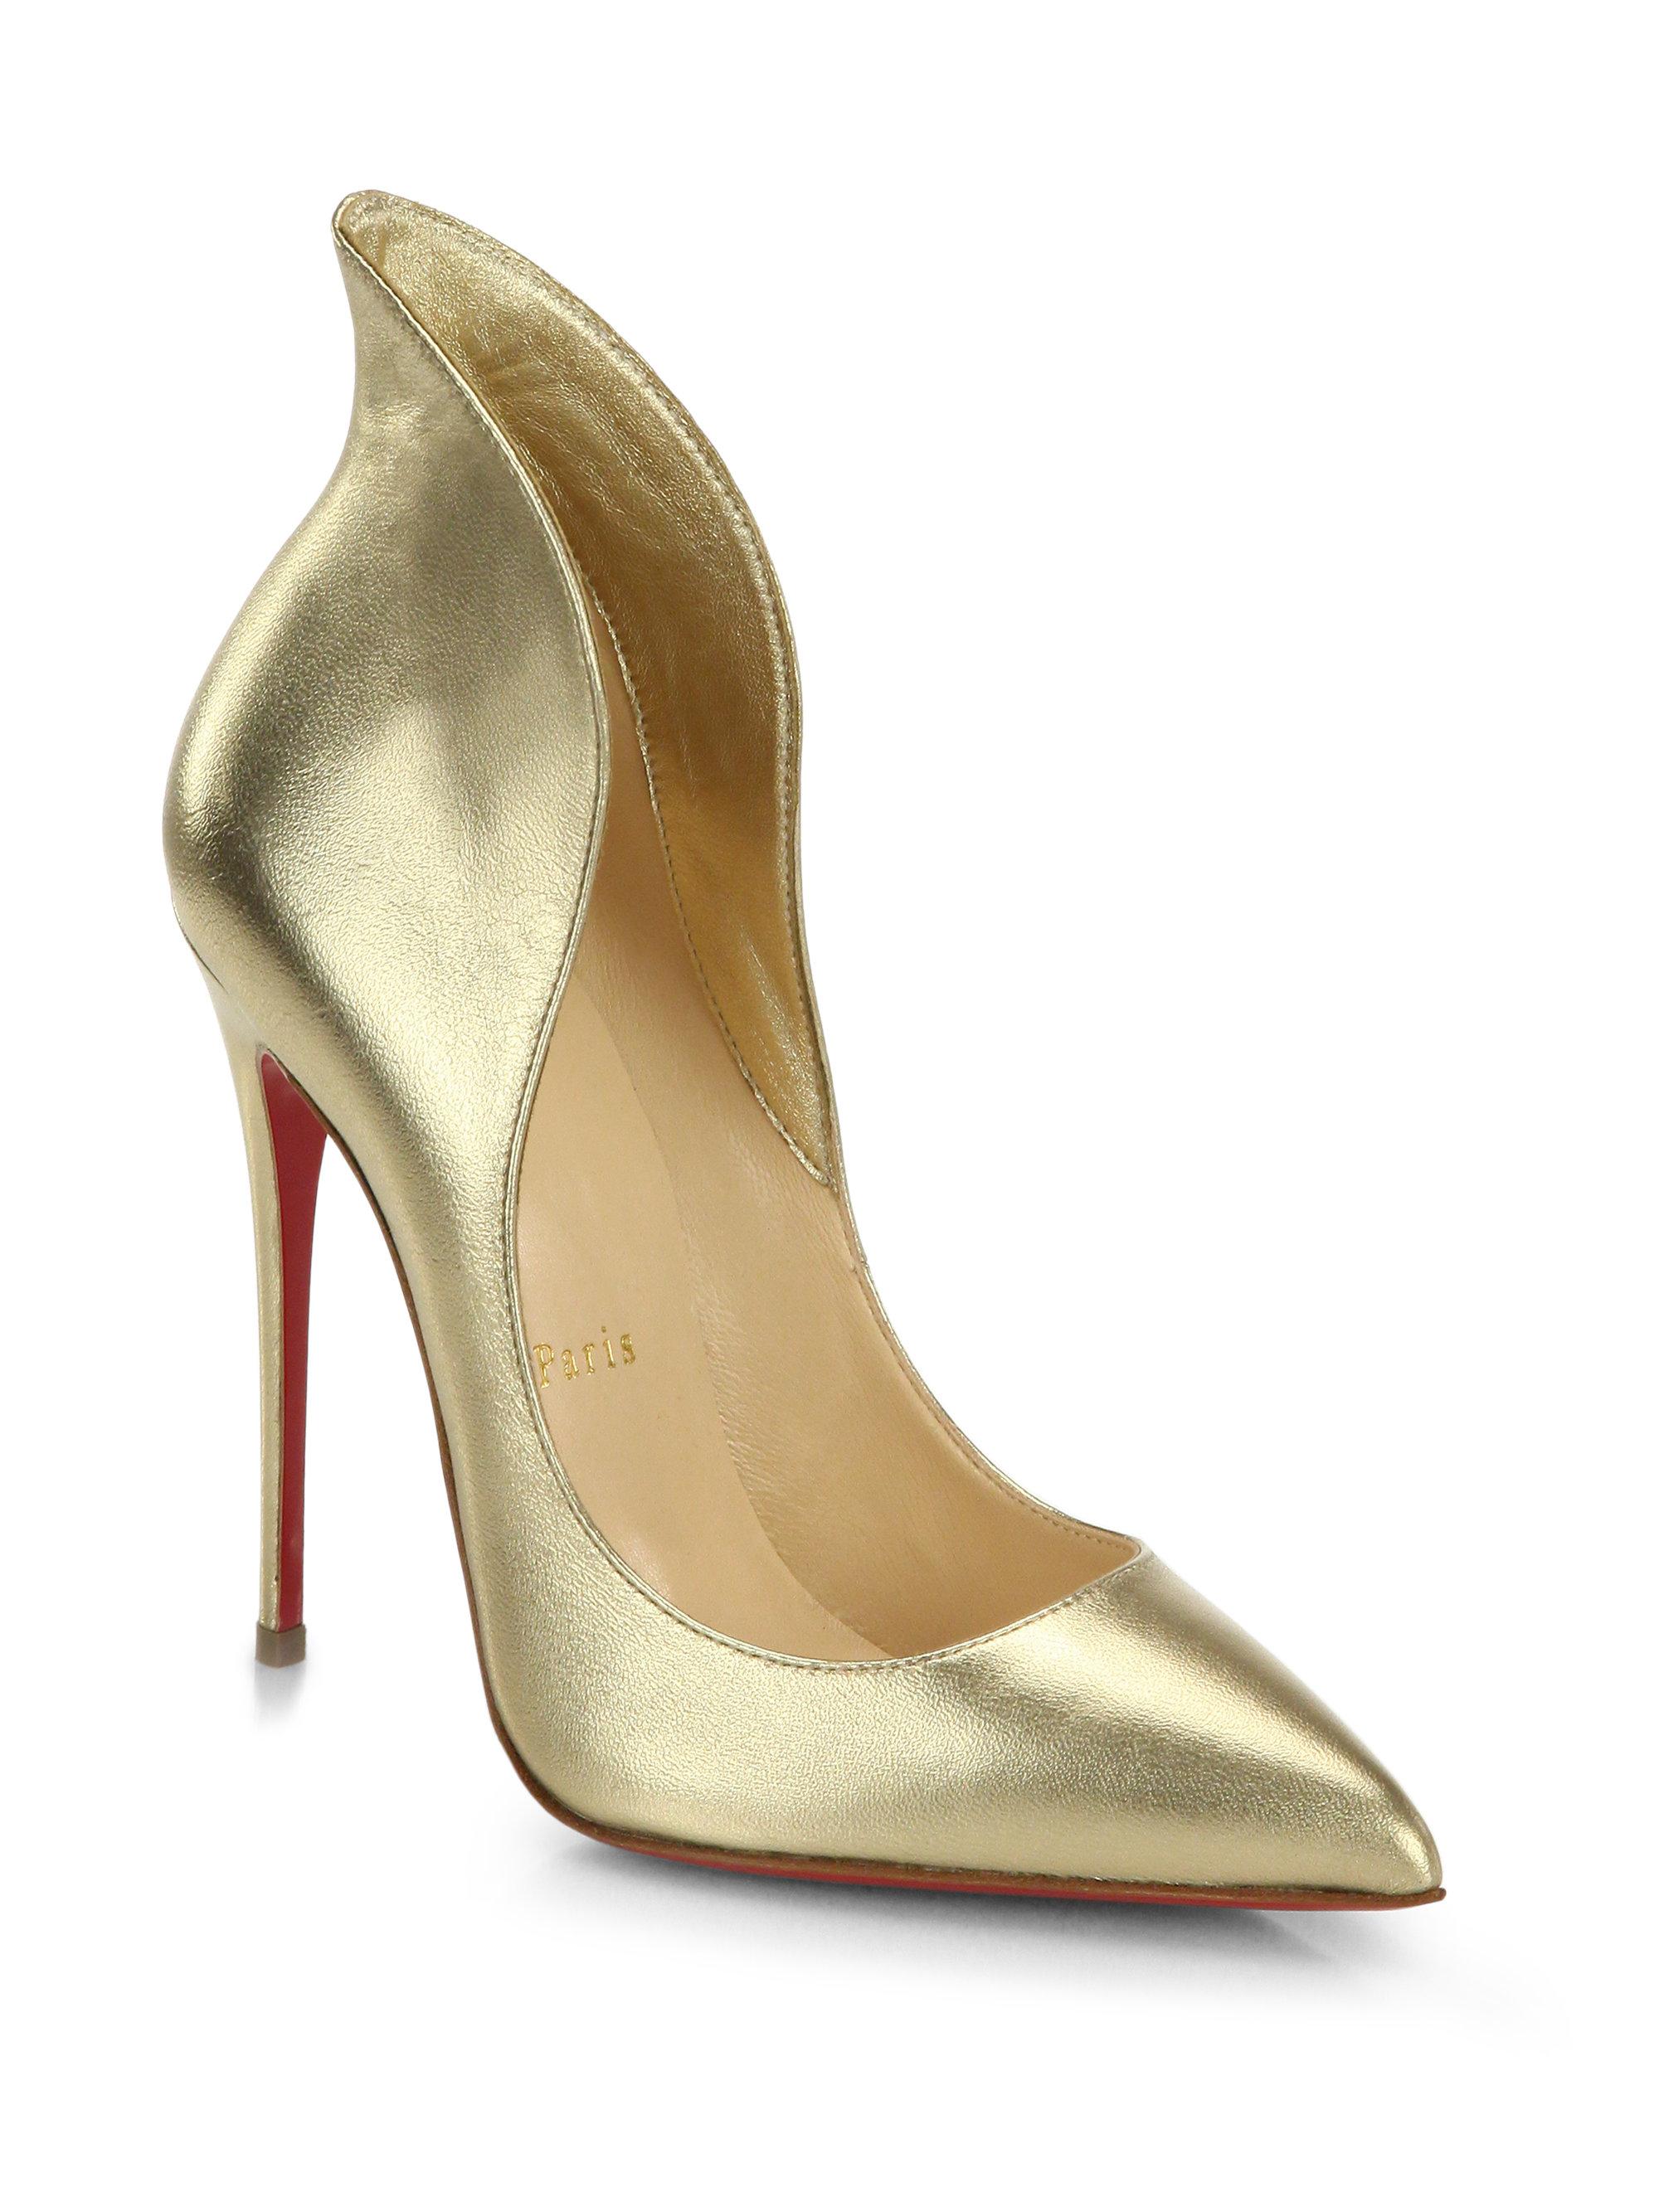 christian louboutin sandals Black suede gold metallic leather trim ...